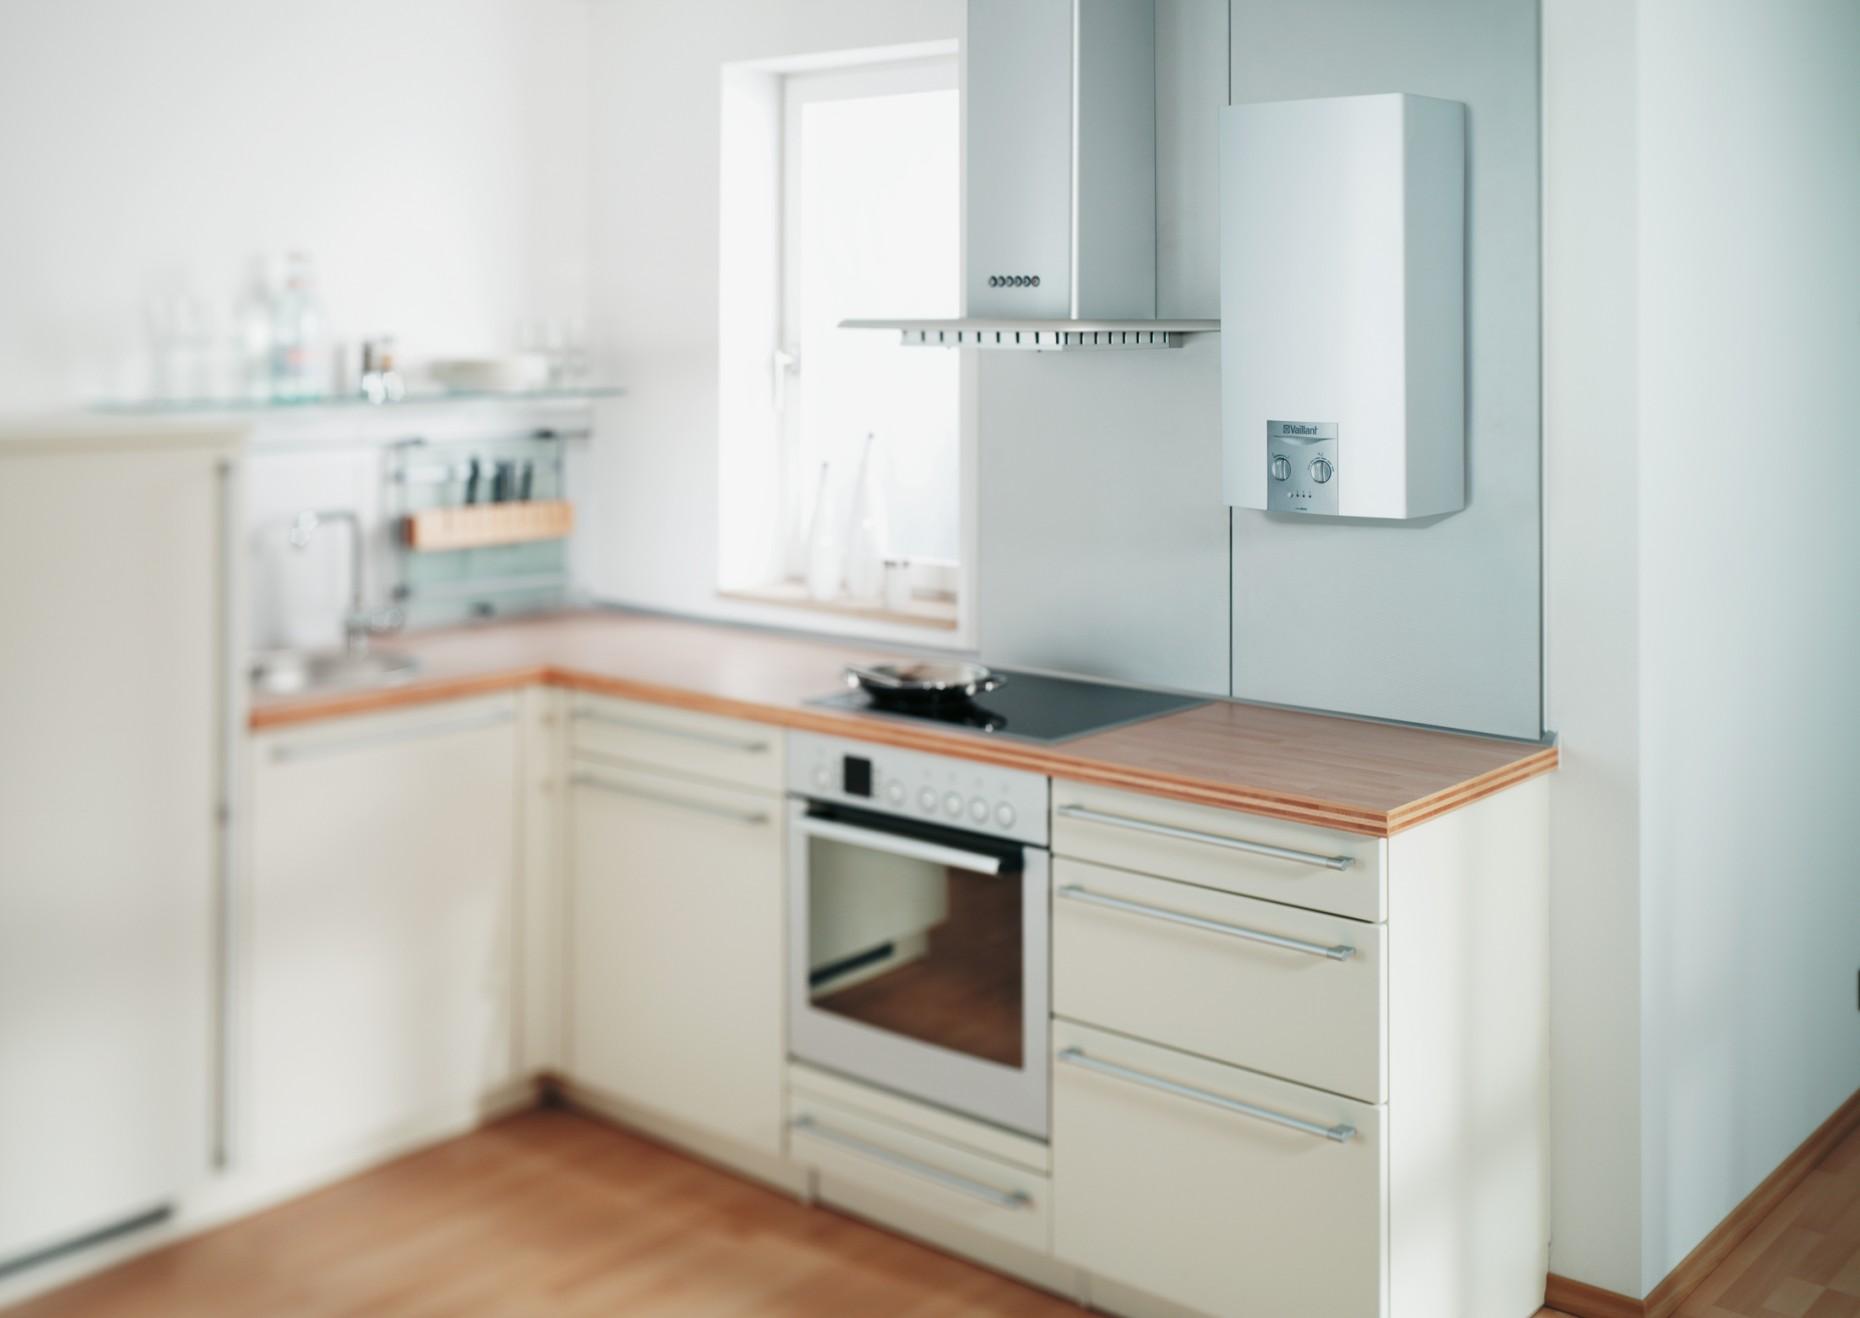 chauffe bain gaz atmomag 14 vaillant sp cialiste chauffe bain gaz avec la gamme atmomag. Black Bedroom Furniture Sets. Home Design Ideas